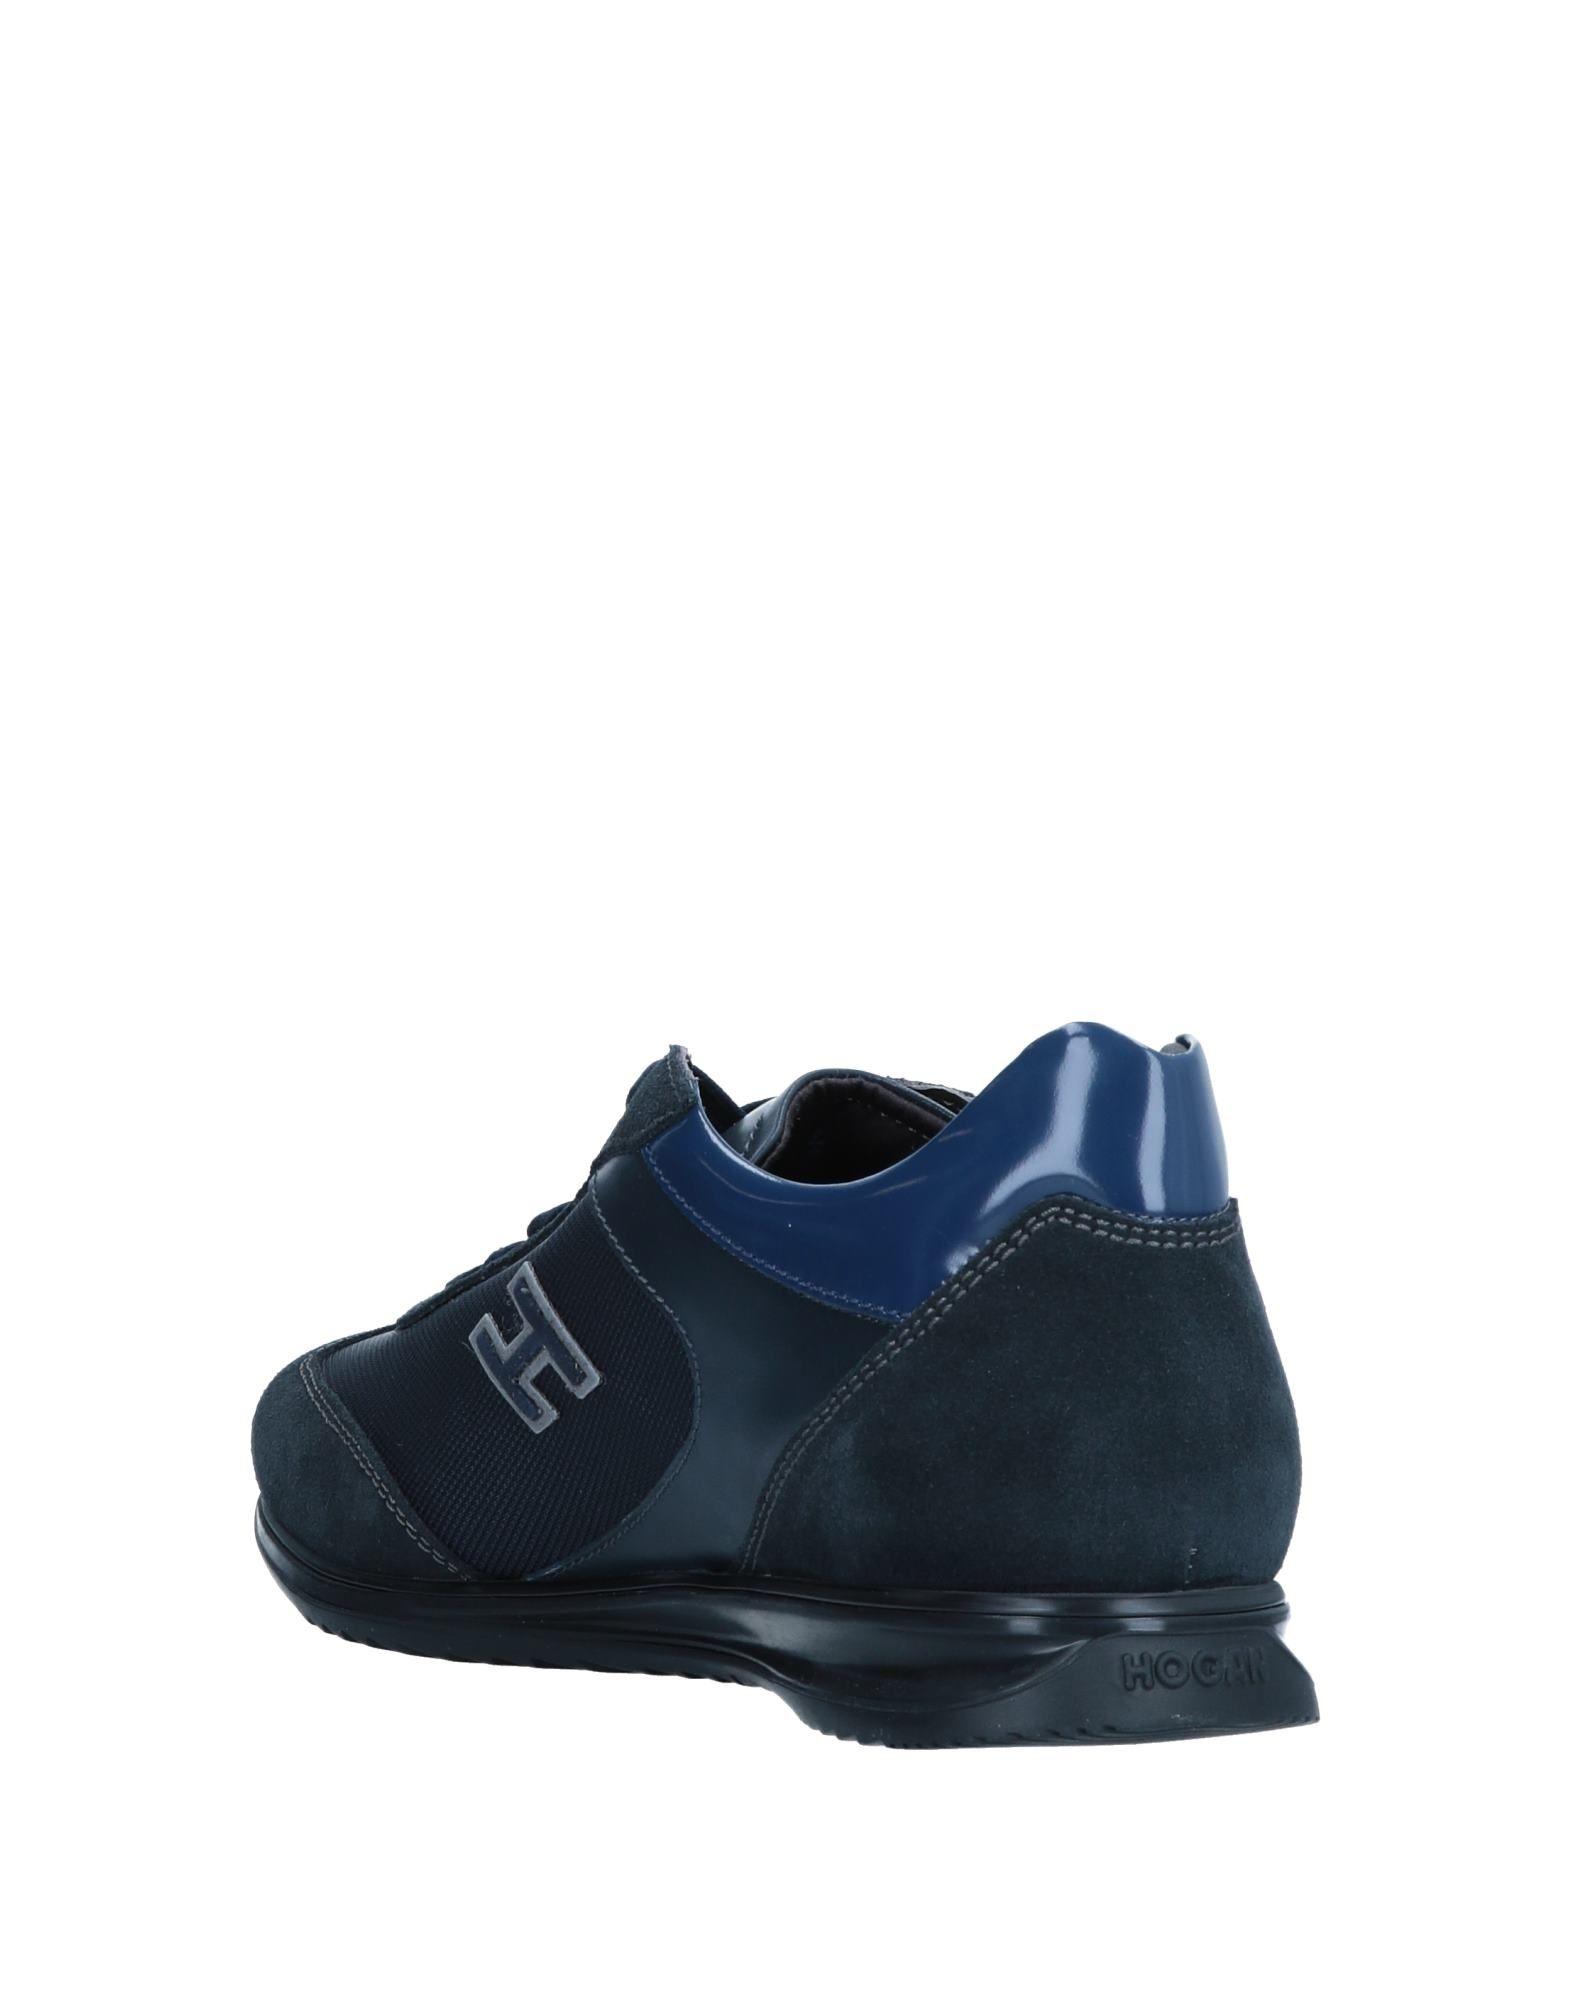 Hogan Sneakers Herren  11556509NS Gute Qualität beliebte Schuhe